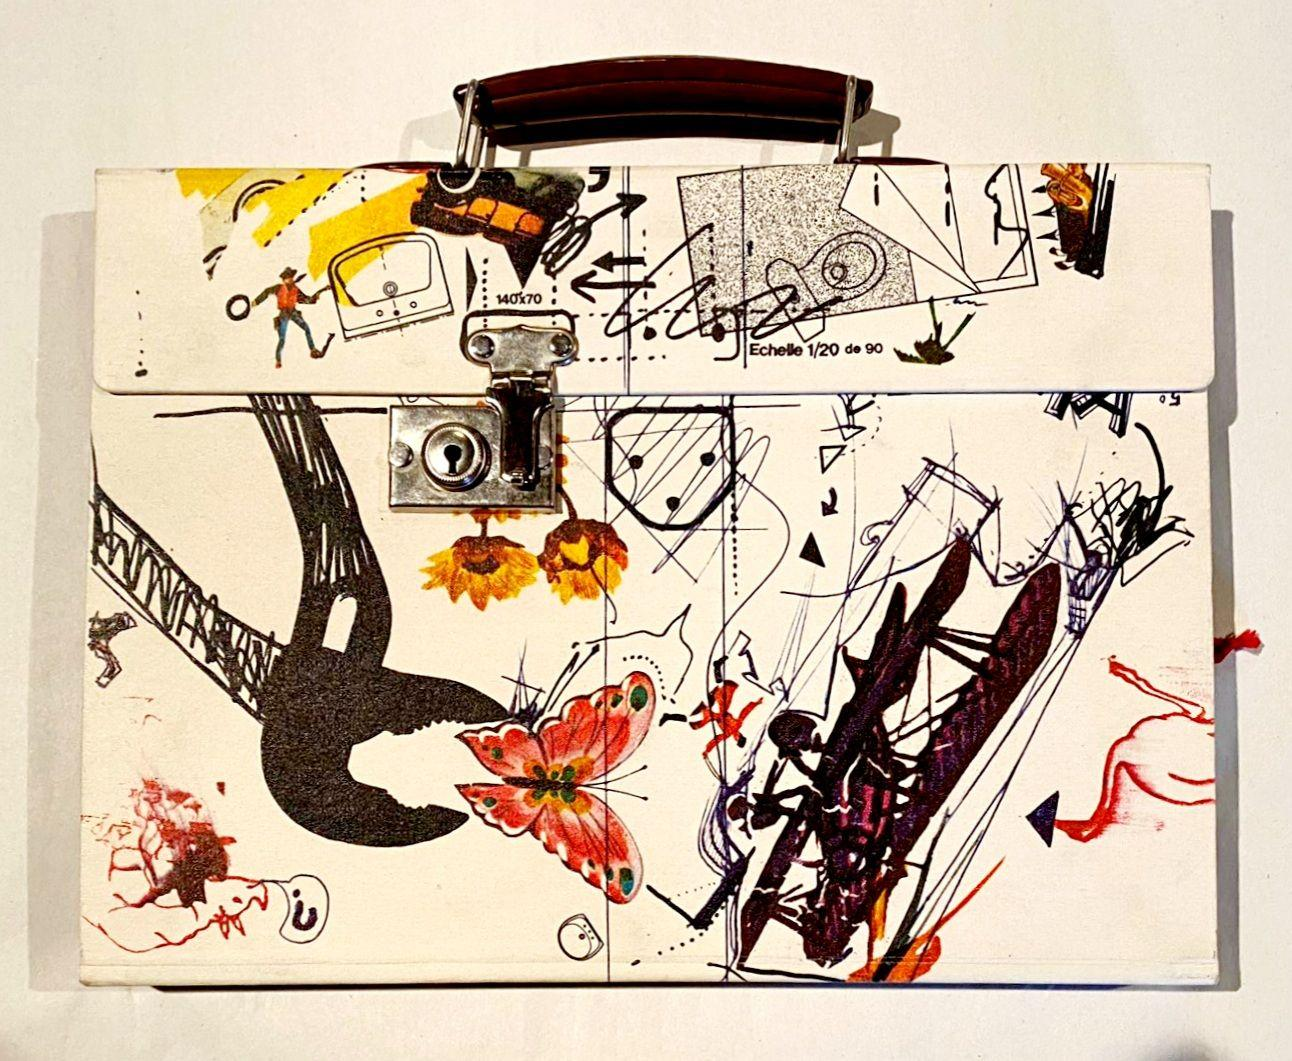 Jean Tinguely - Meta, 1973